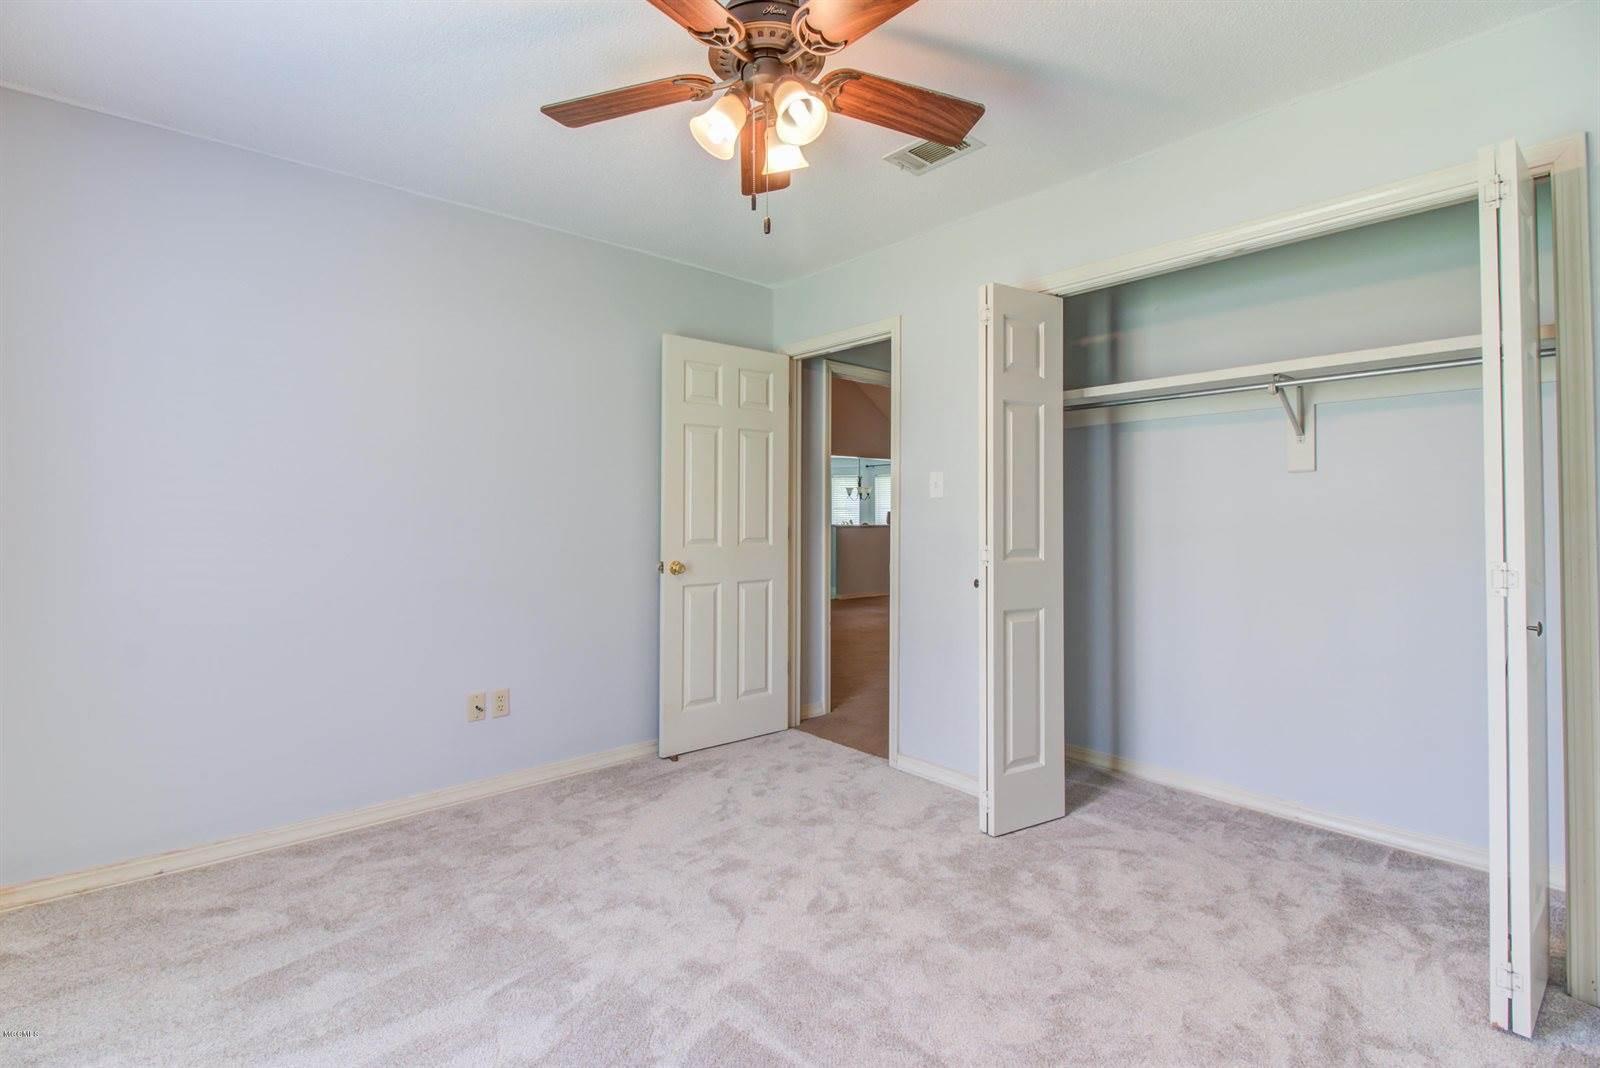 15083 Sagewood St, Gulfport, MS 39503